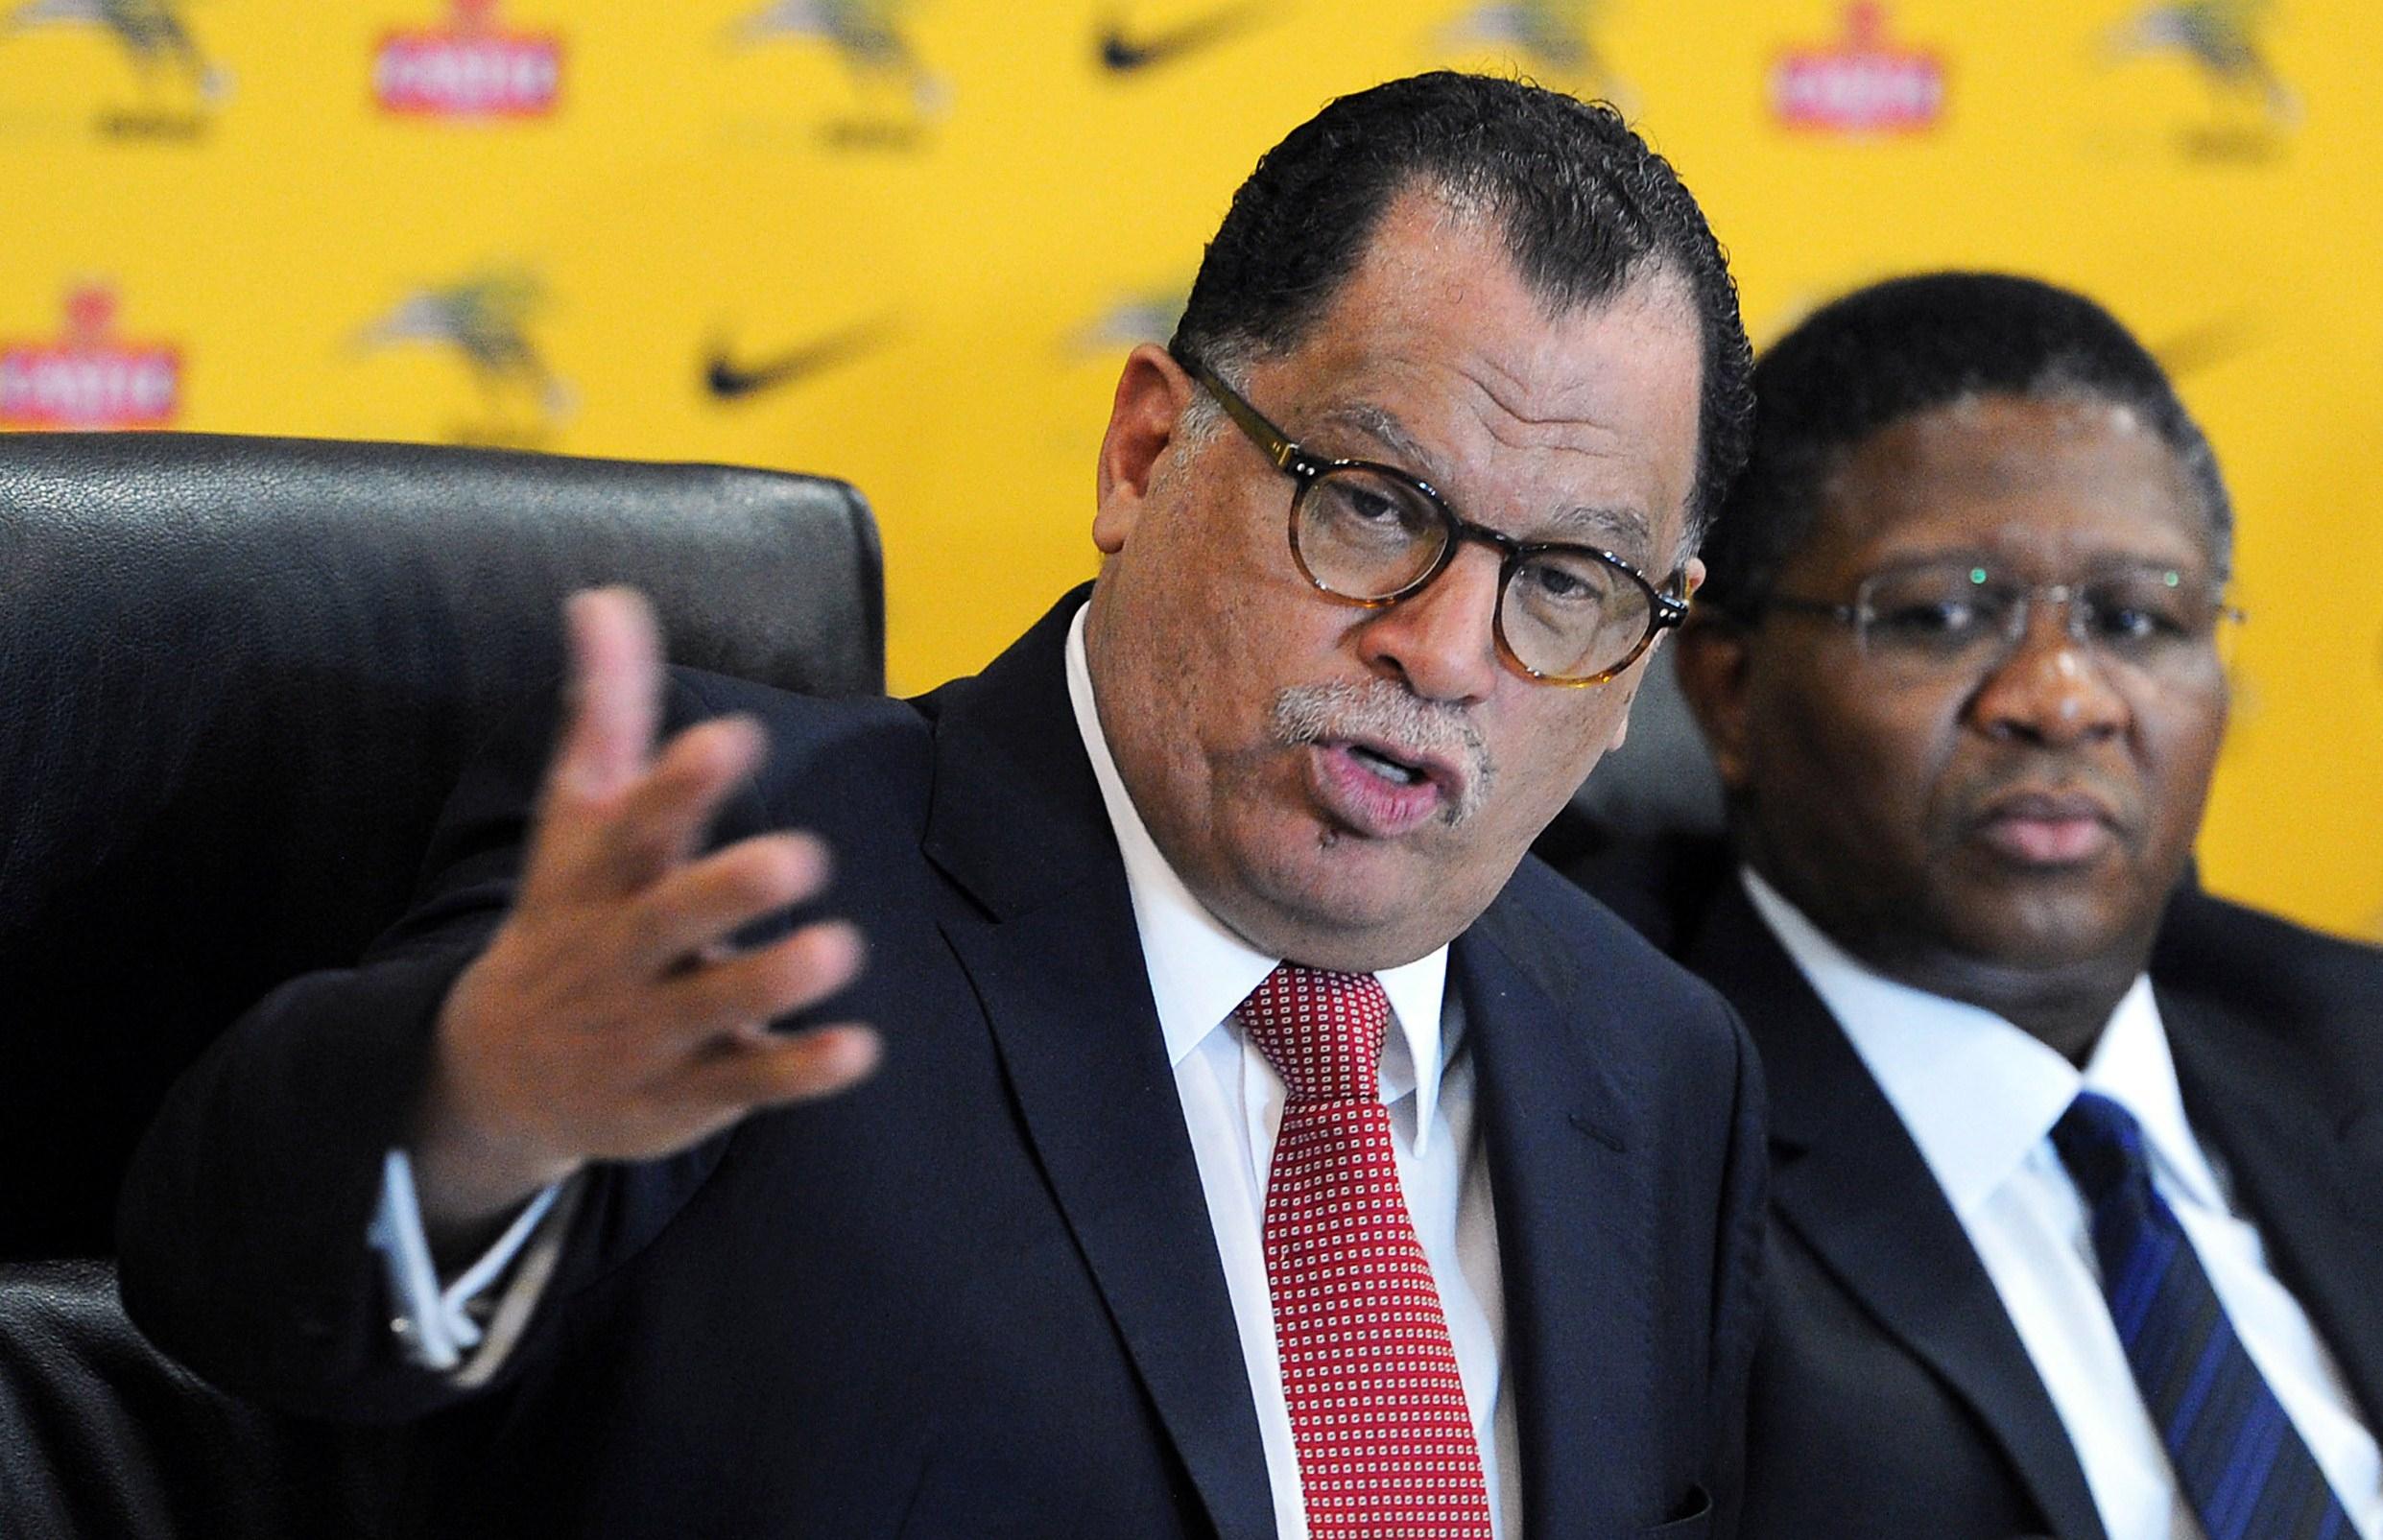 Bafana Bafana To Face Guinea-Bissau, Angola In Friendlies